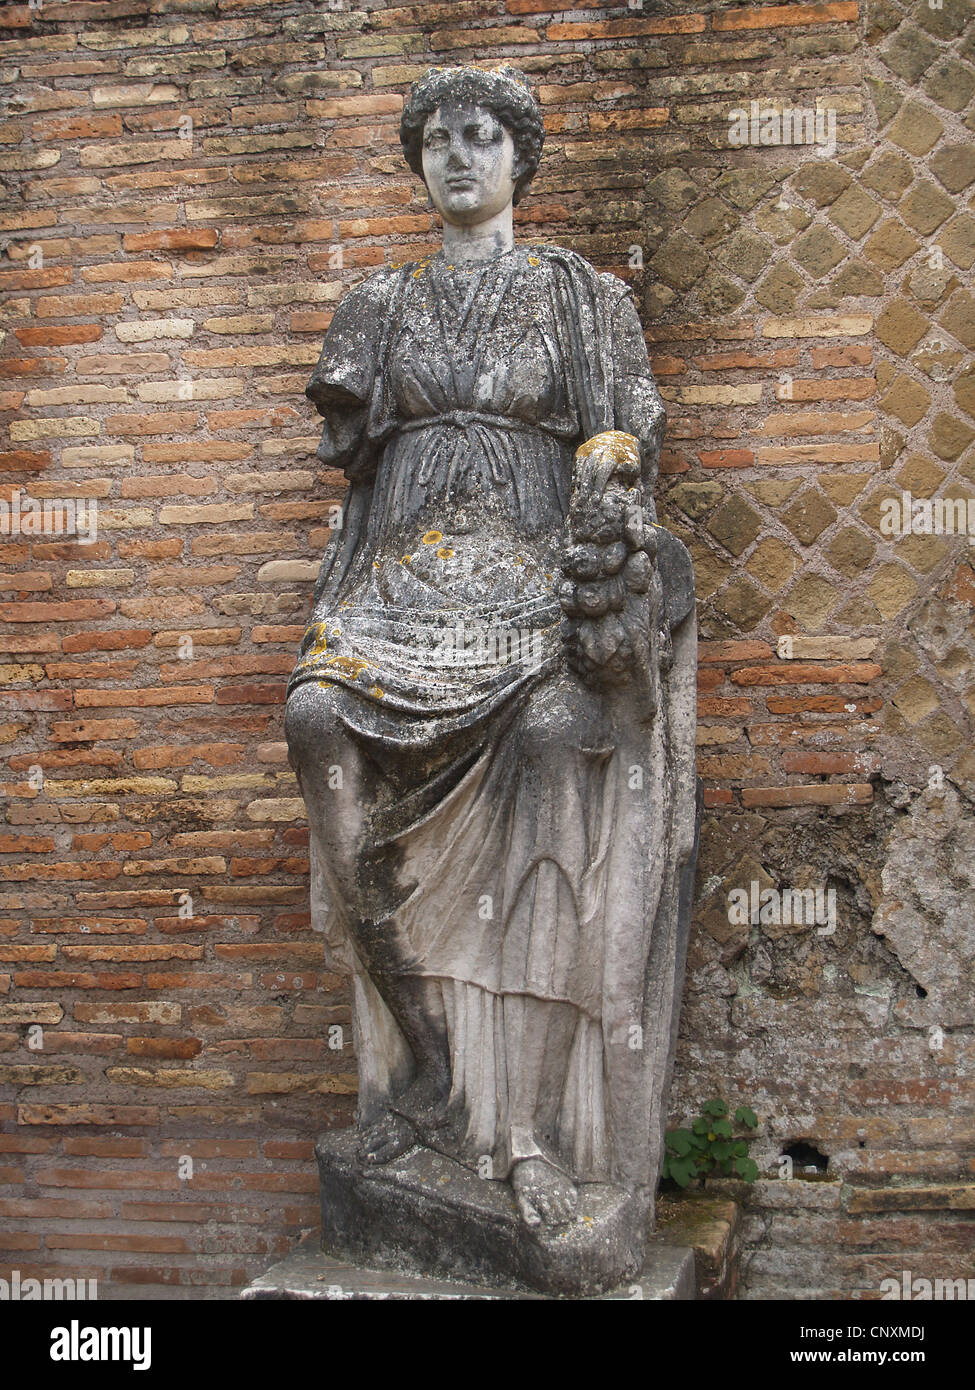 Roman statue at Ostia Antica, Rome - Stock Image